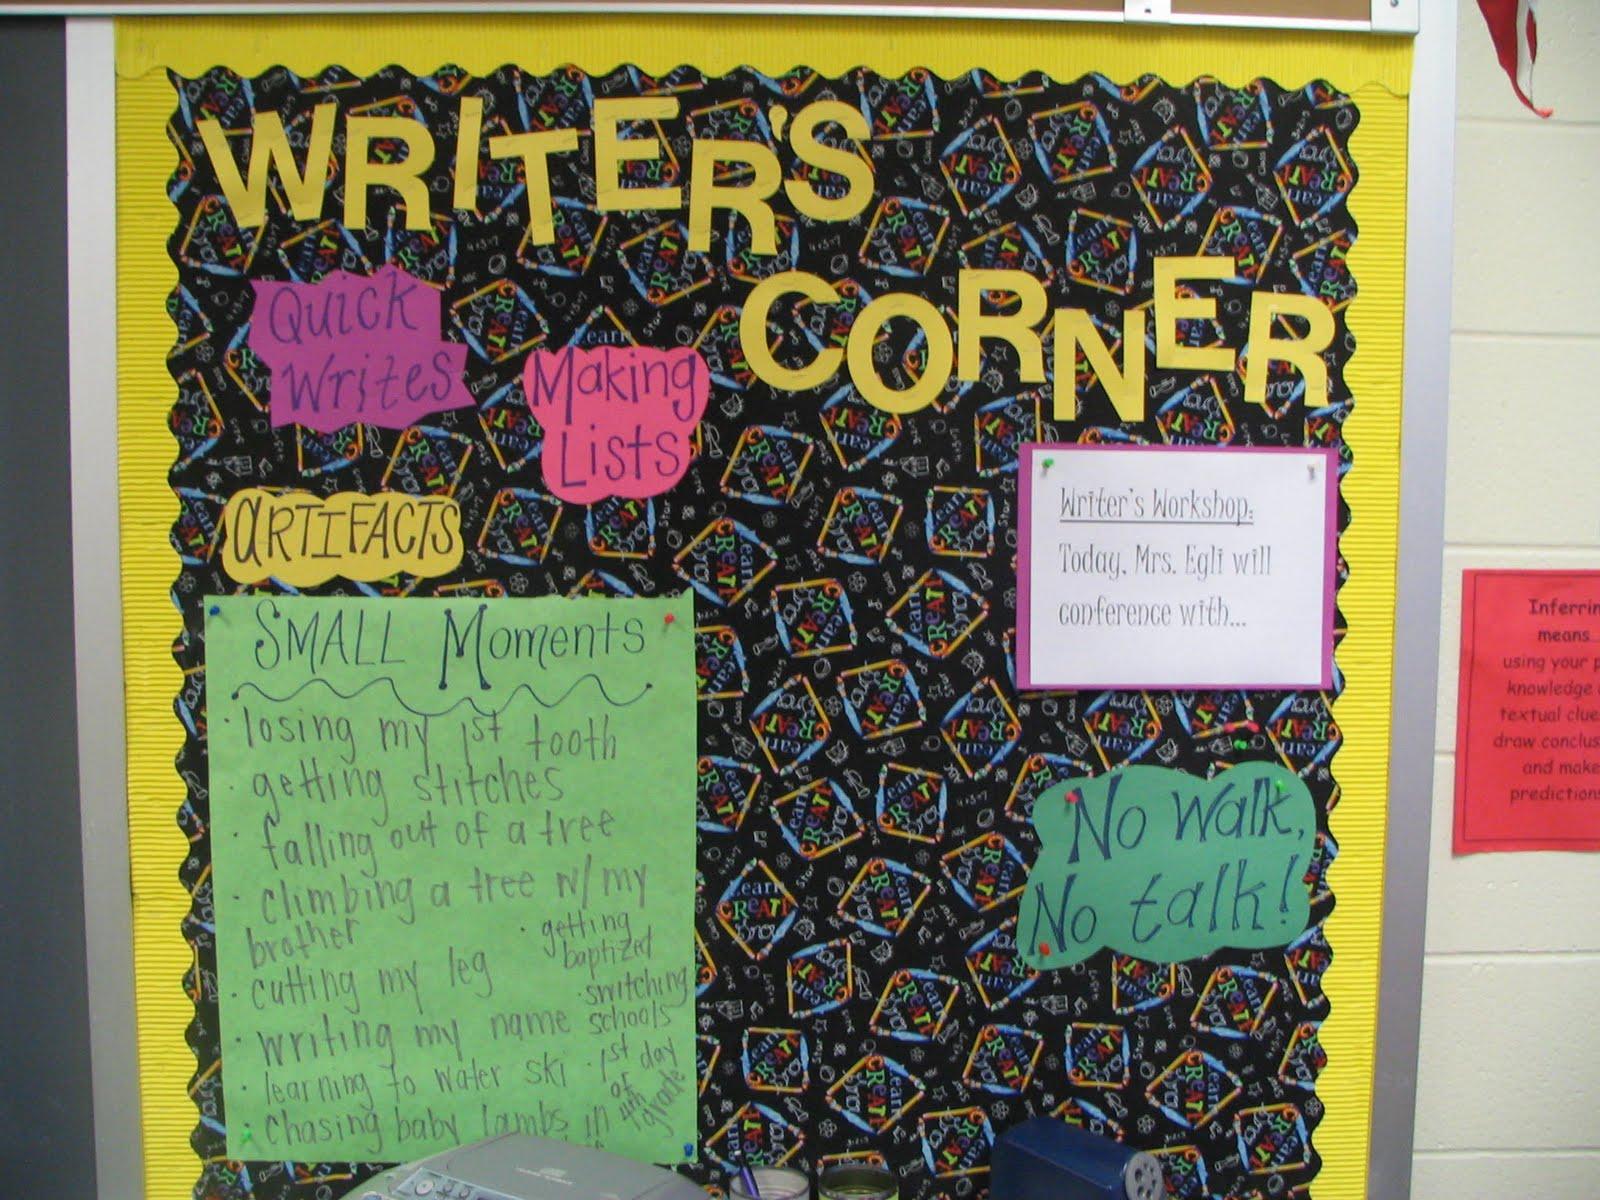 Mrs egli 39 s class blog november 2009 - Writing corner ideas ...